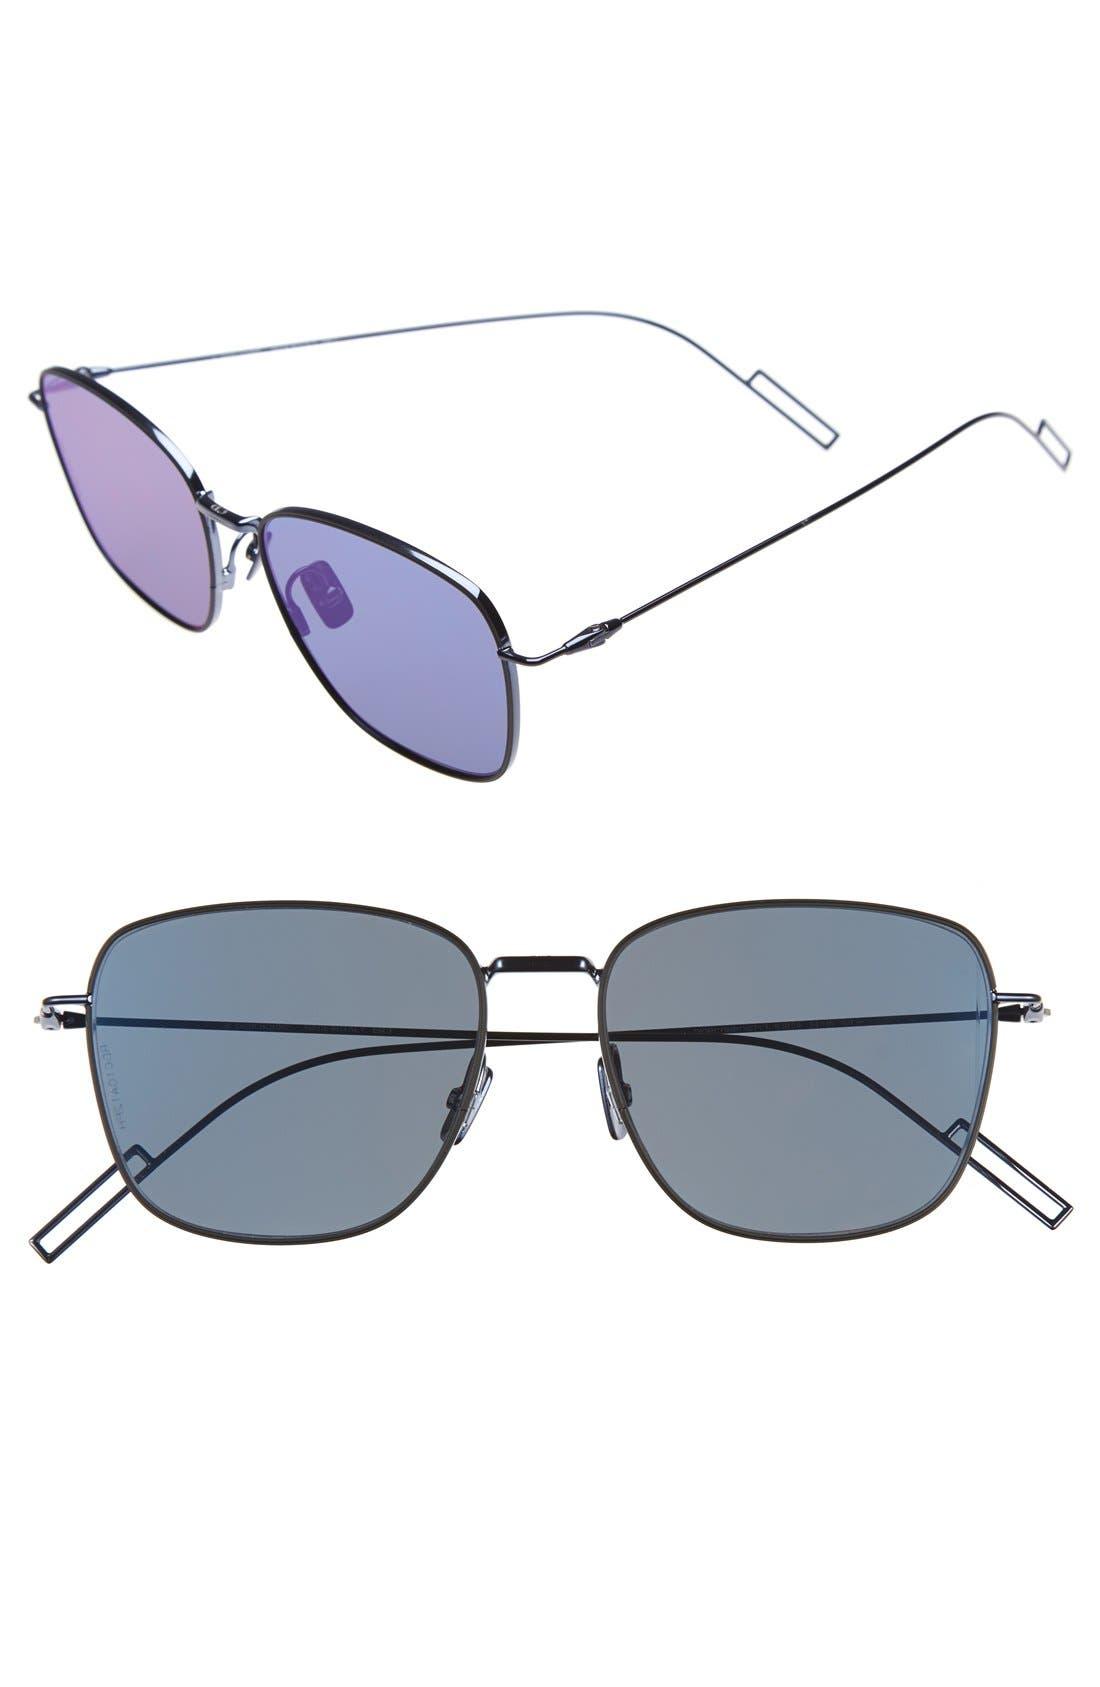 'Composit 1.1S' 54mm Metal Sunglasses,                         Main,                         color, Blue Palladium/ Blue Mirror